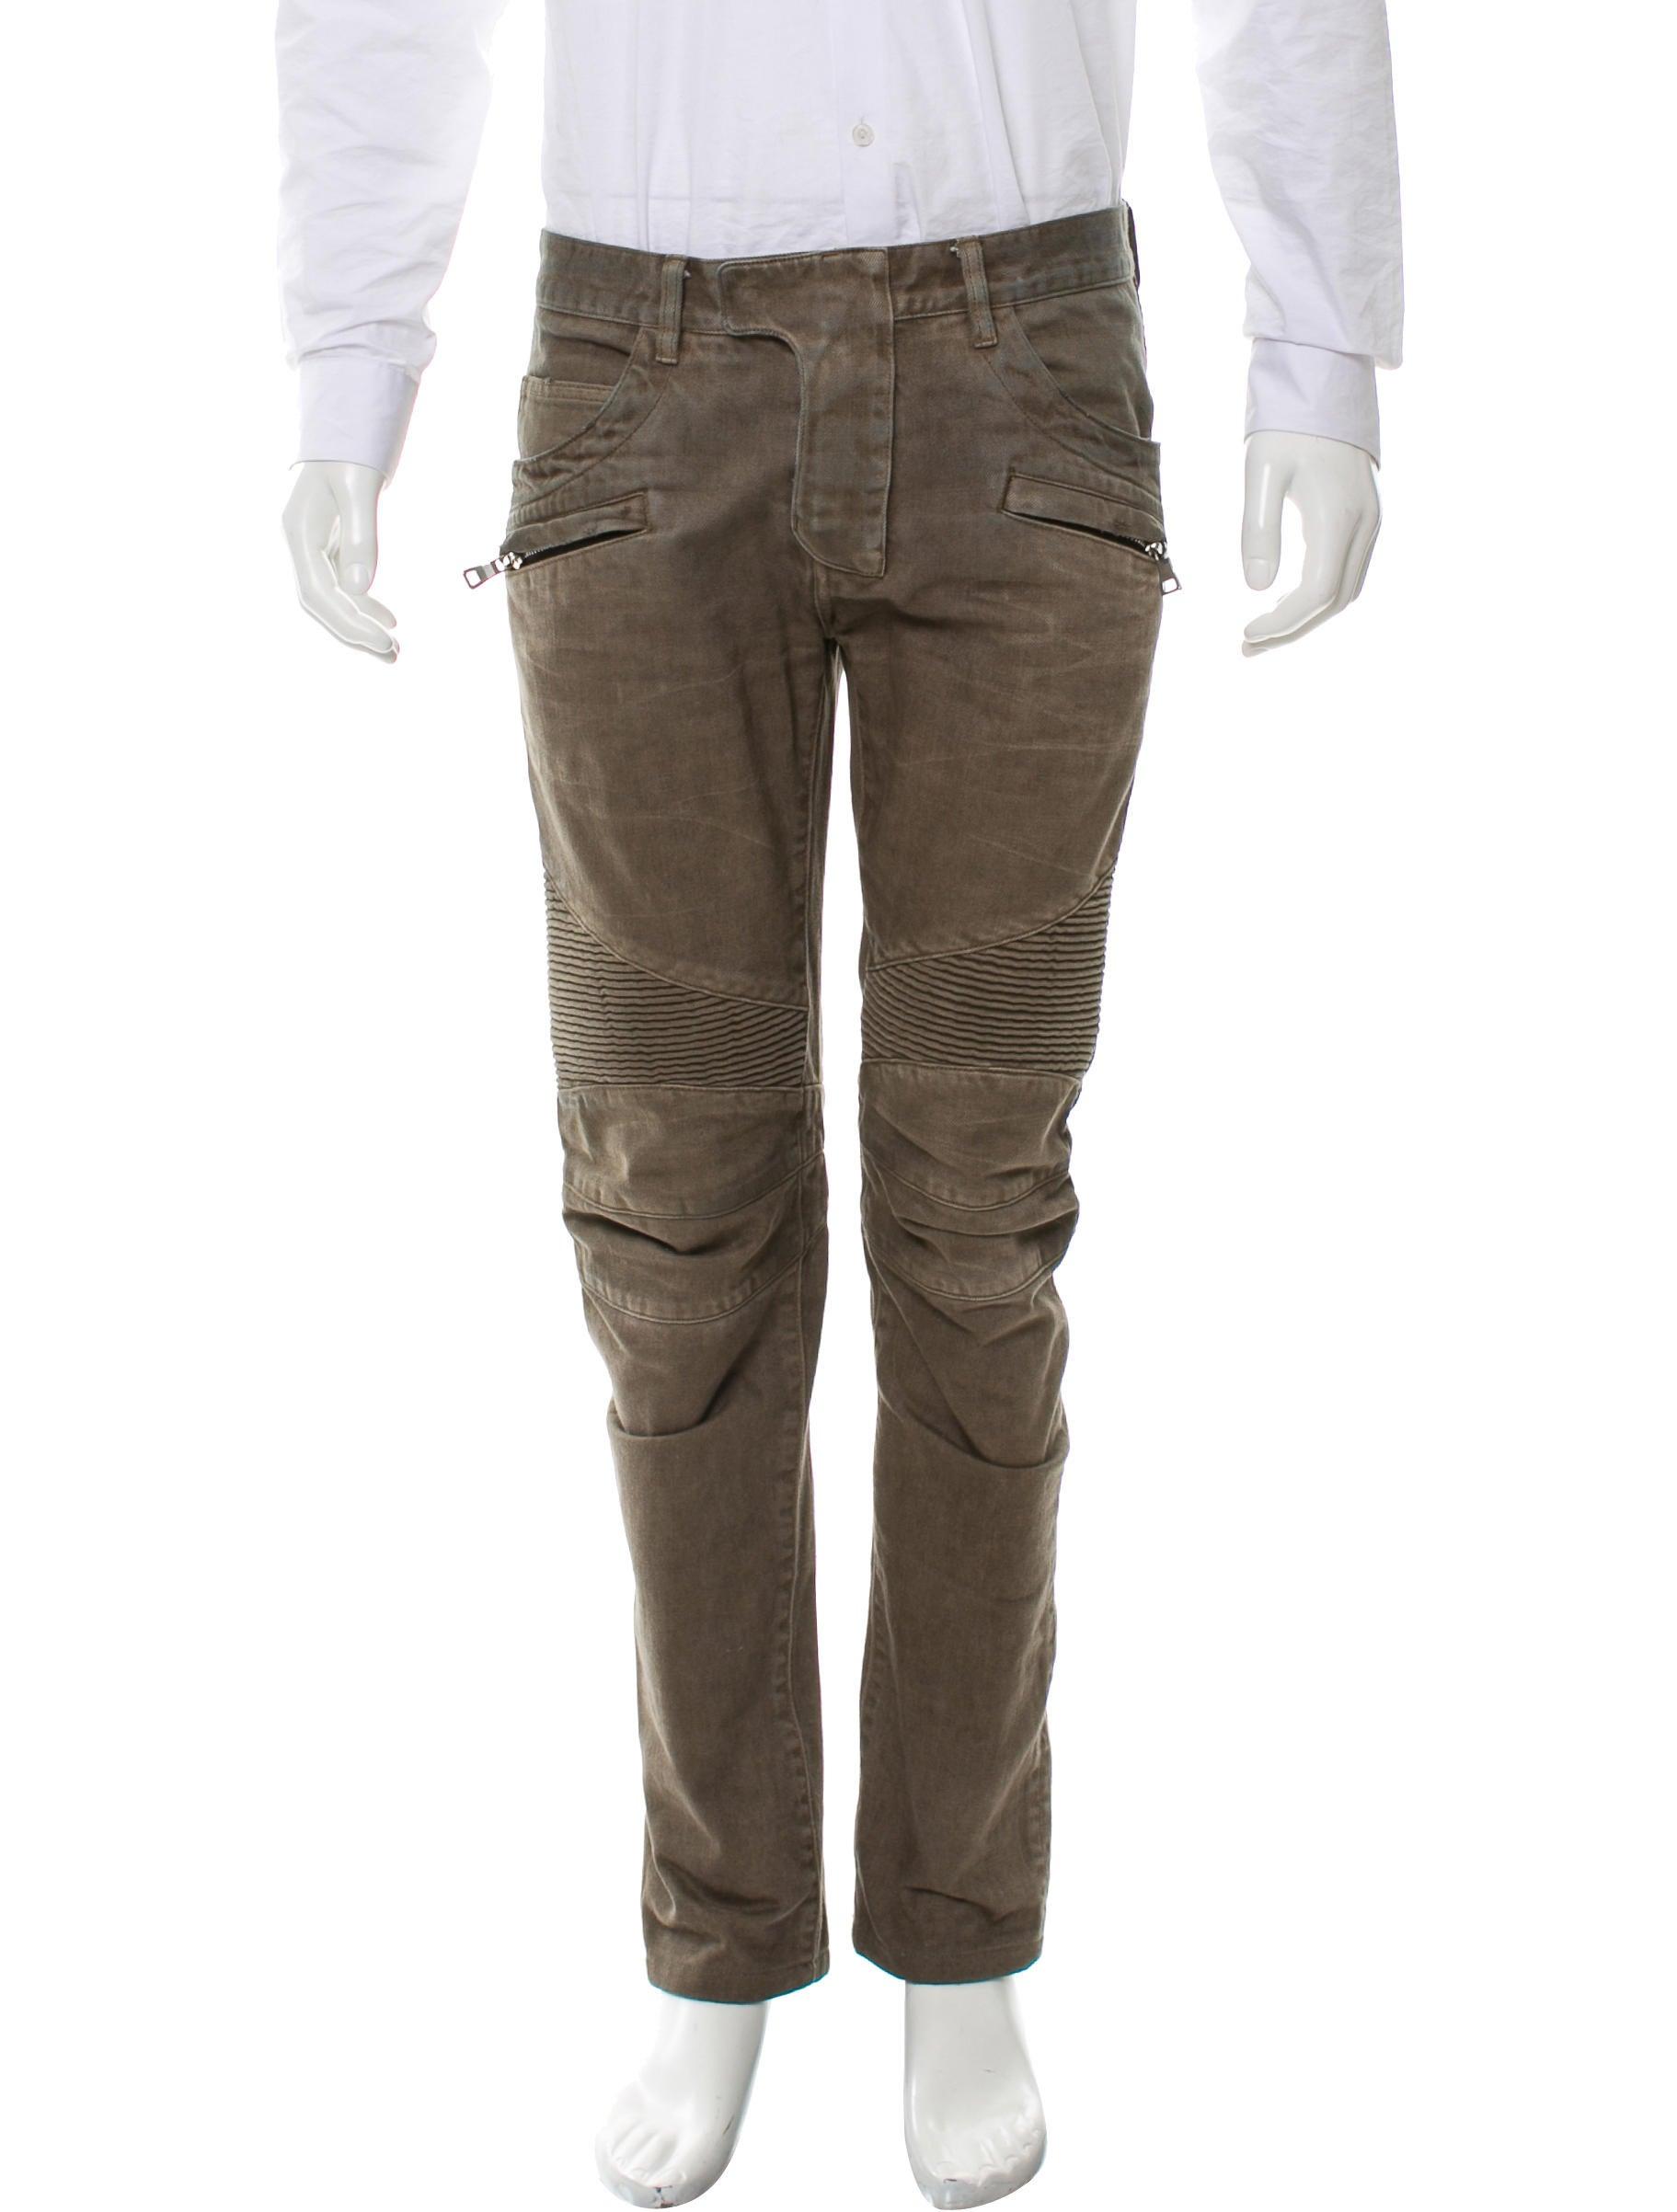 b09e365e Balmain Distressed Moto Jeans - Clothing - BAM25578   The RealReal